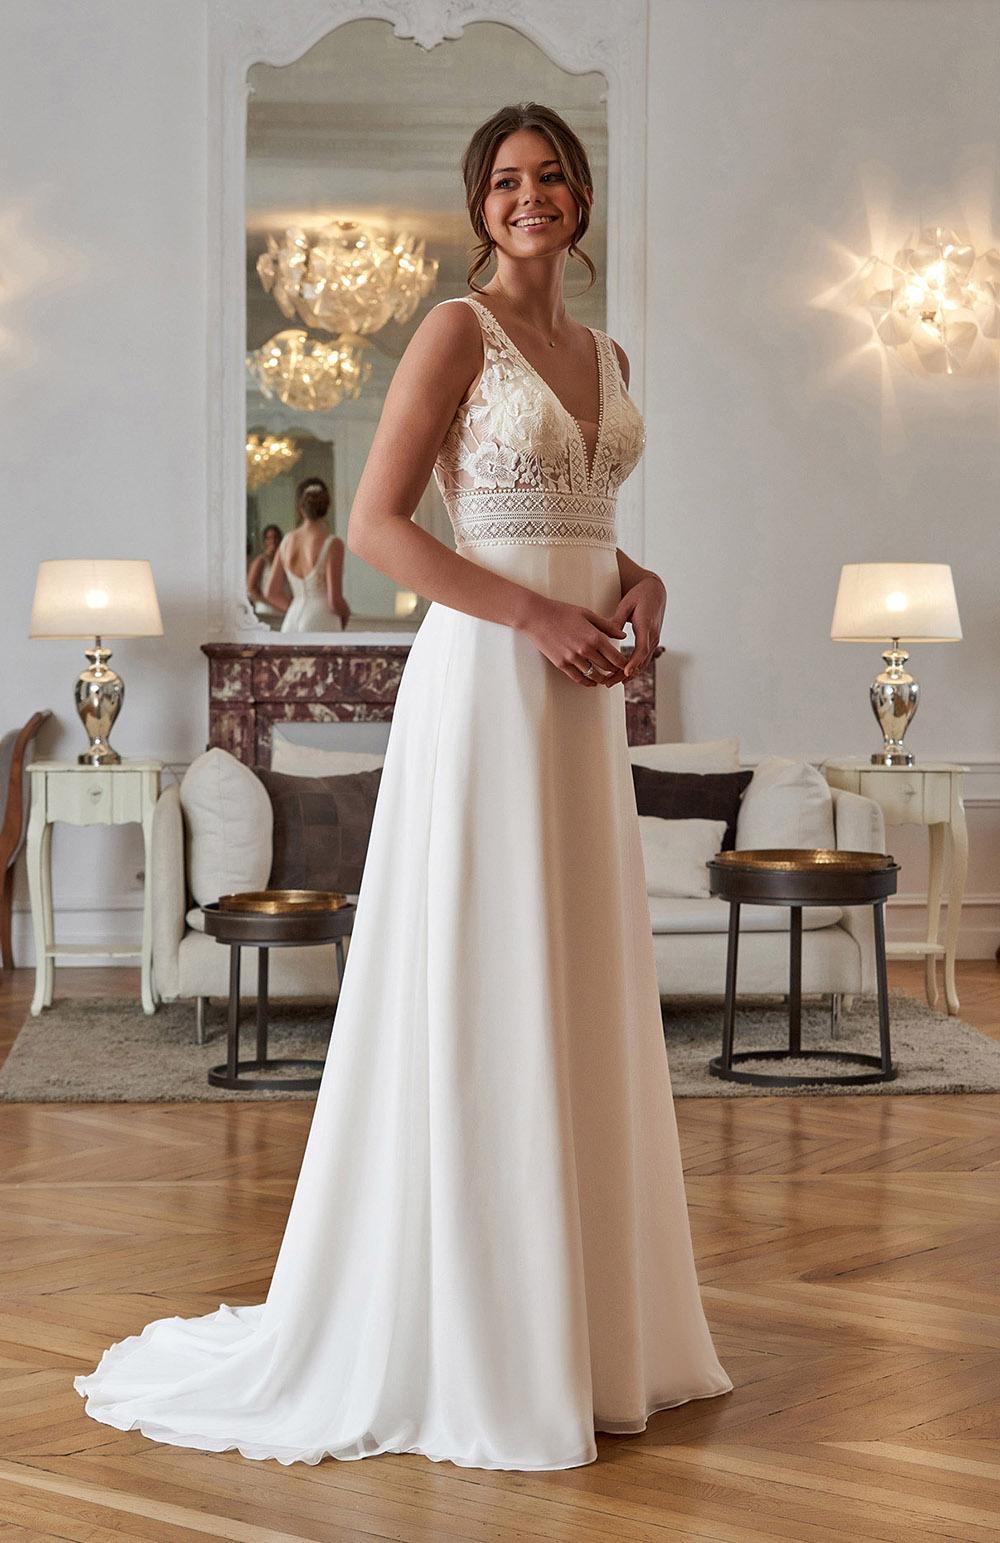 Robe de mariée Modèle Elauna